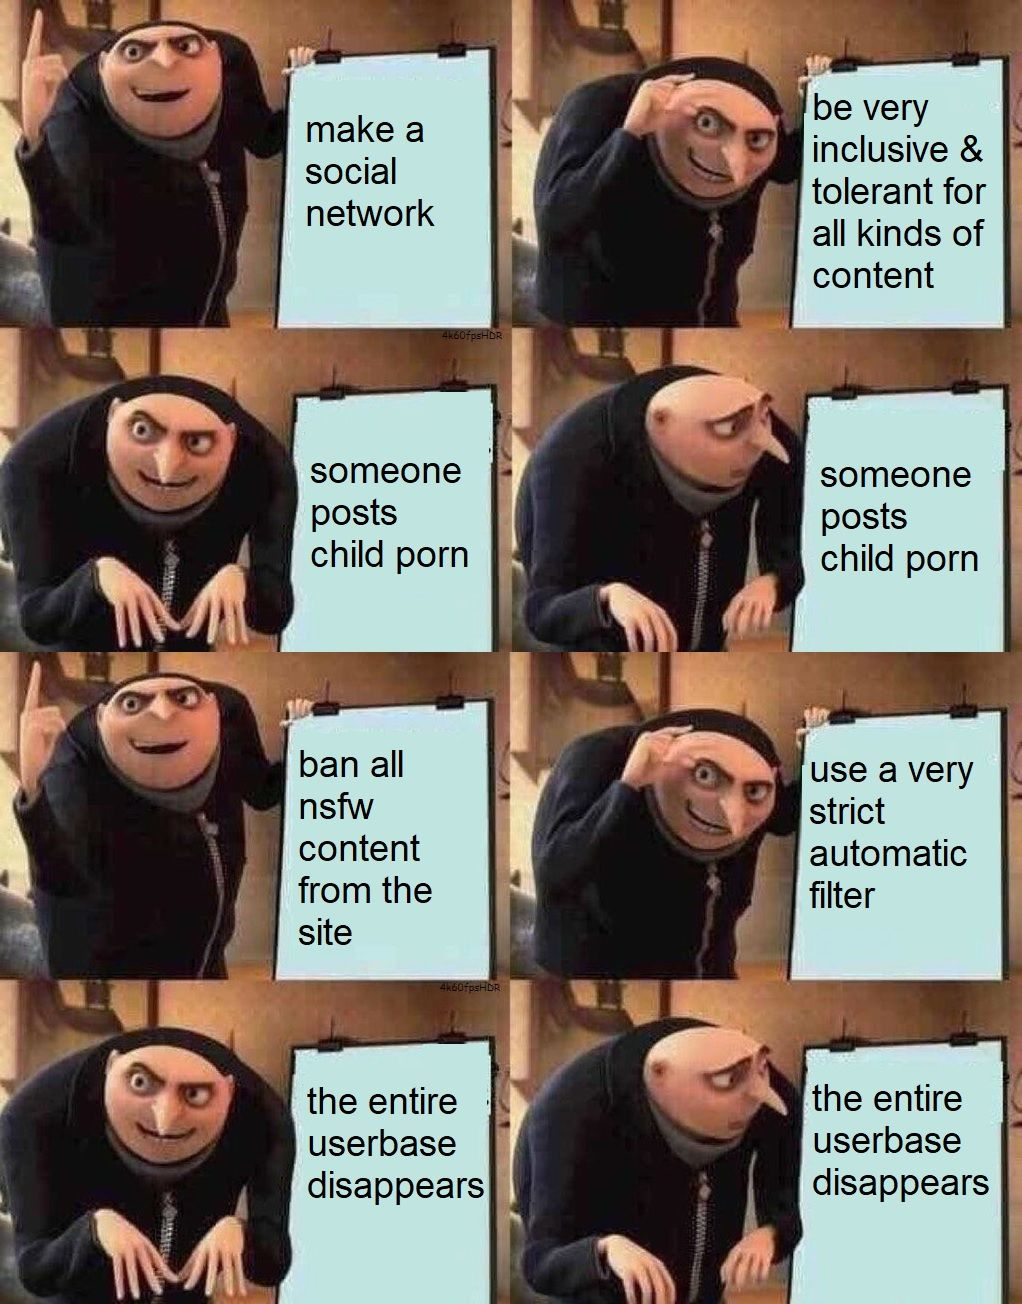 nice plan u got there